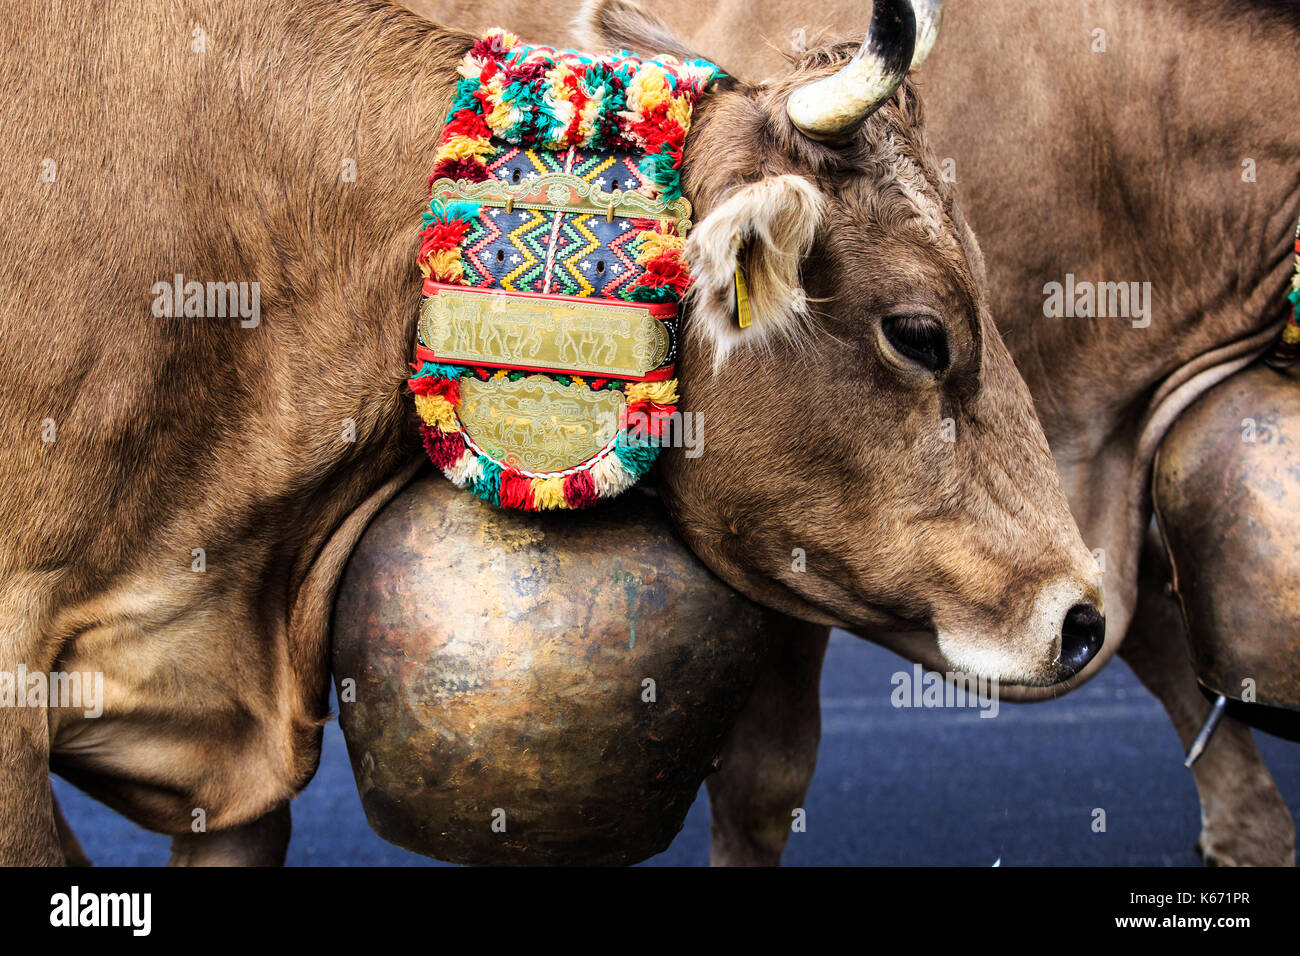 Swiss Cow Bells Stock Photos Amp Swiss Cow Bells Stock